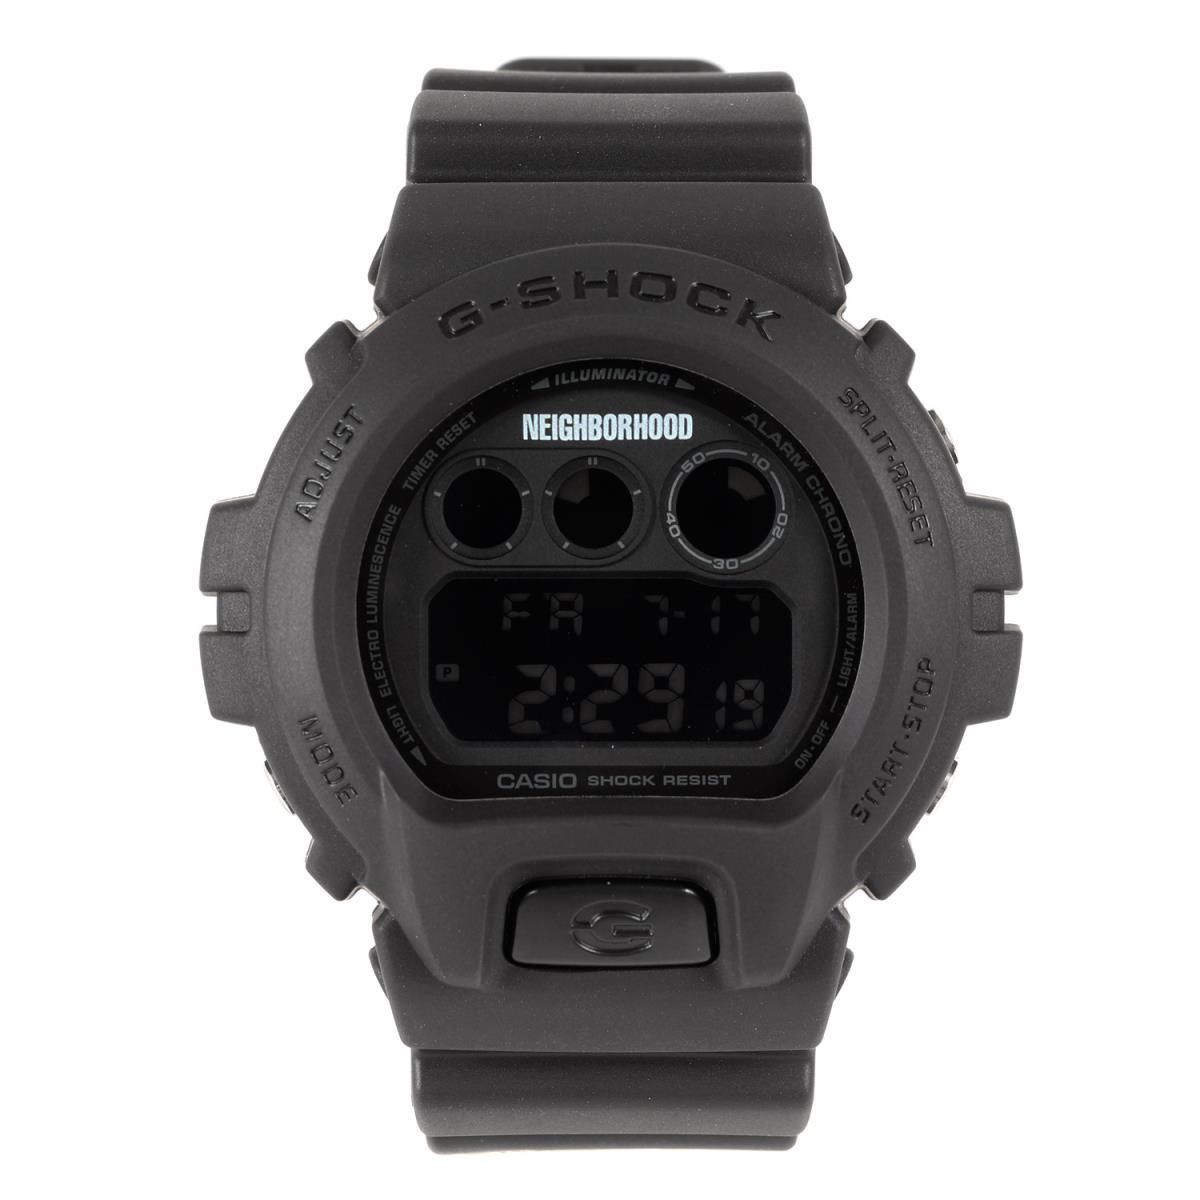 NEIGHBORHOOD ネイバーフッド G-SHOCK ジーショック DW-6900FS 腕時計 ウォッチ18SS ブラック 【メンズ】【中古】【美品】【K2720】